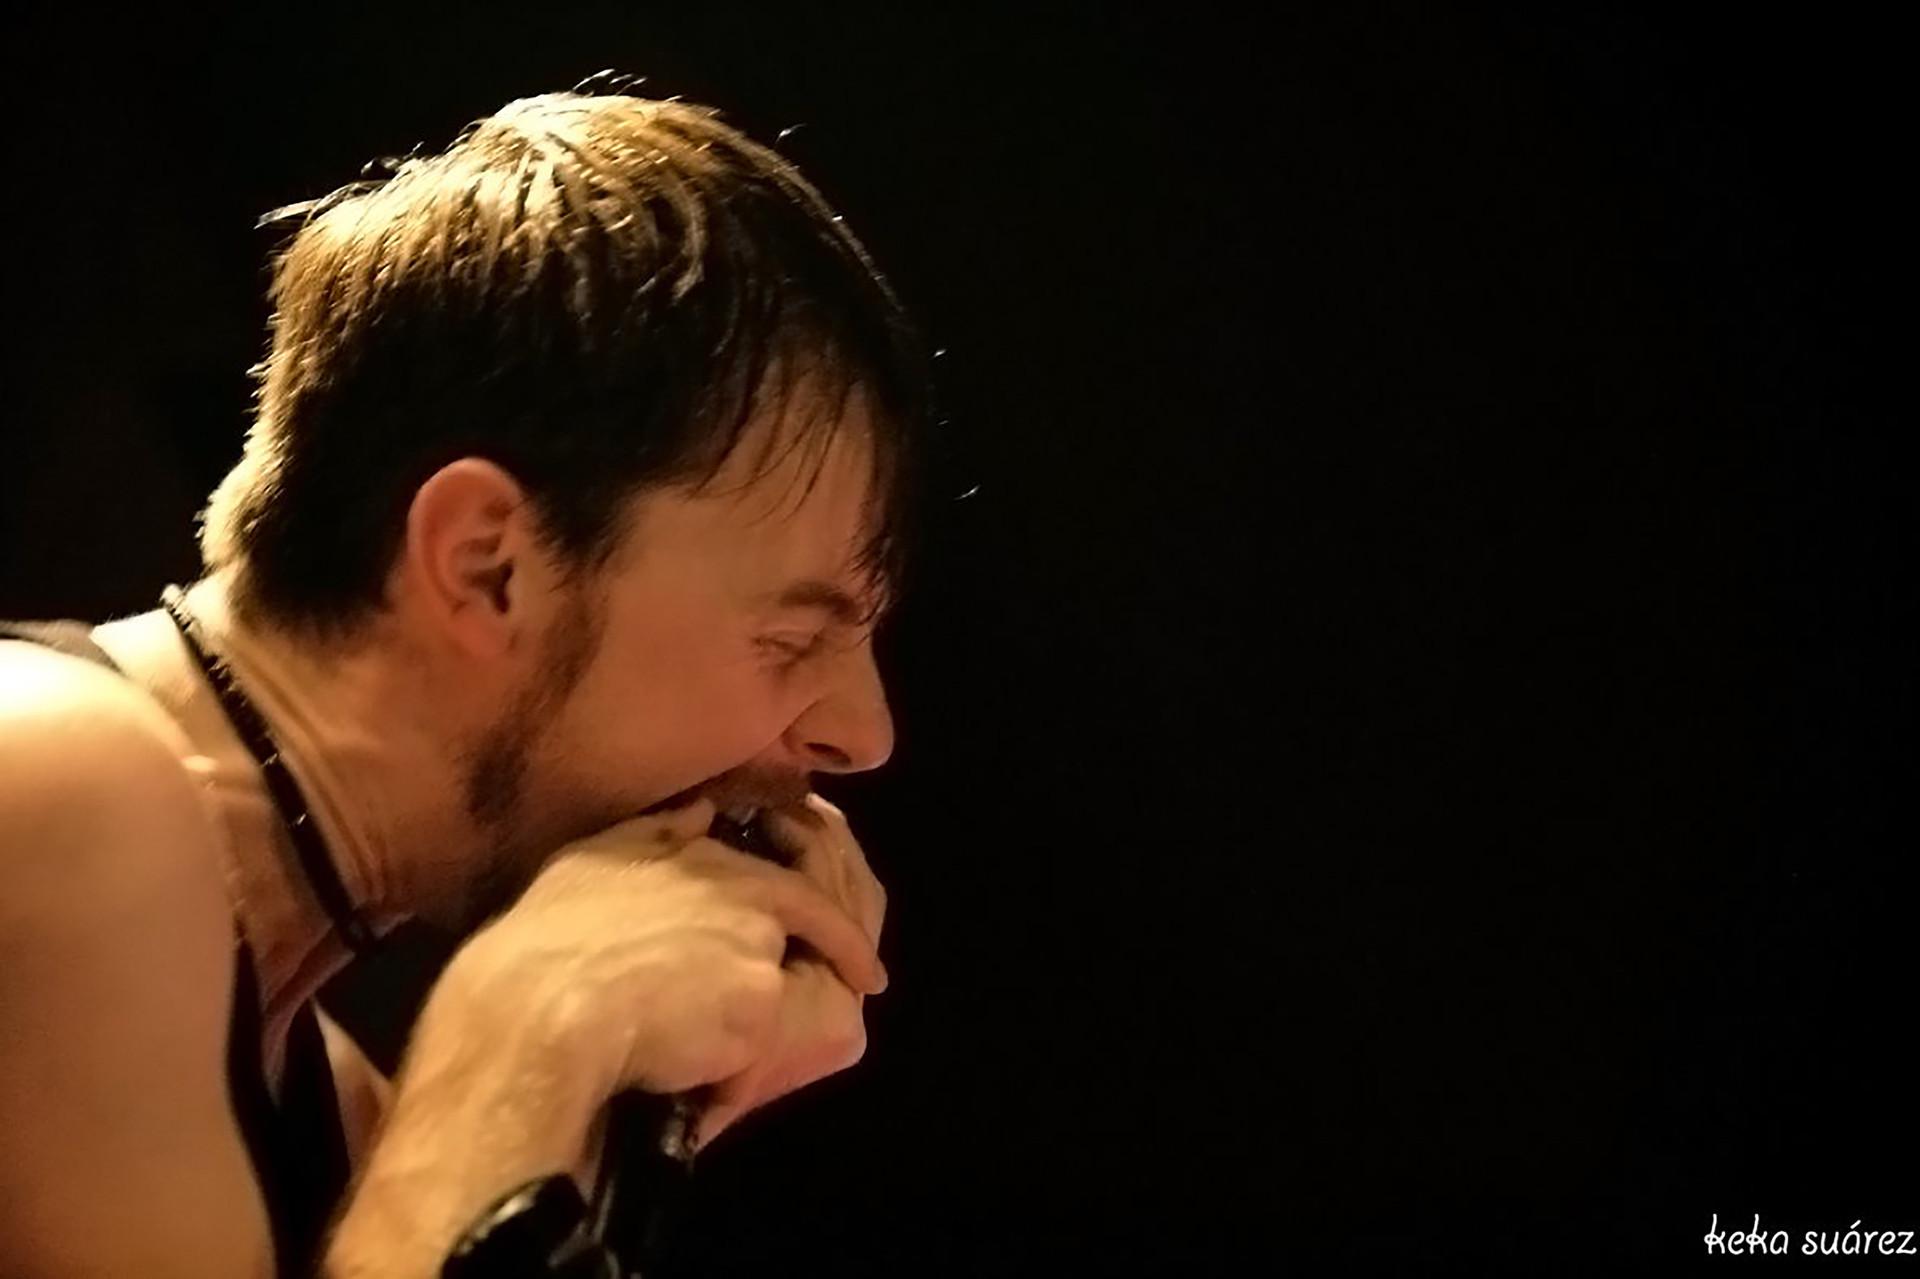 Kertone Production - Jerkov Musiques - My Own Private Alaska (MOPA) - Matthieu Miegeville (Milka) - Photo Live Concert